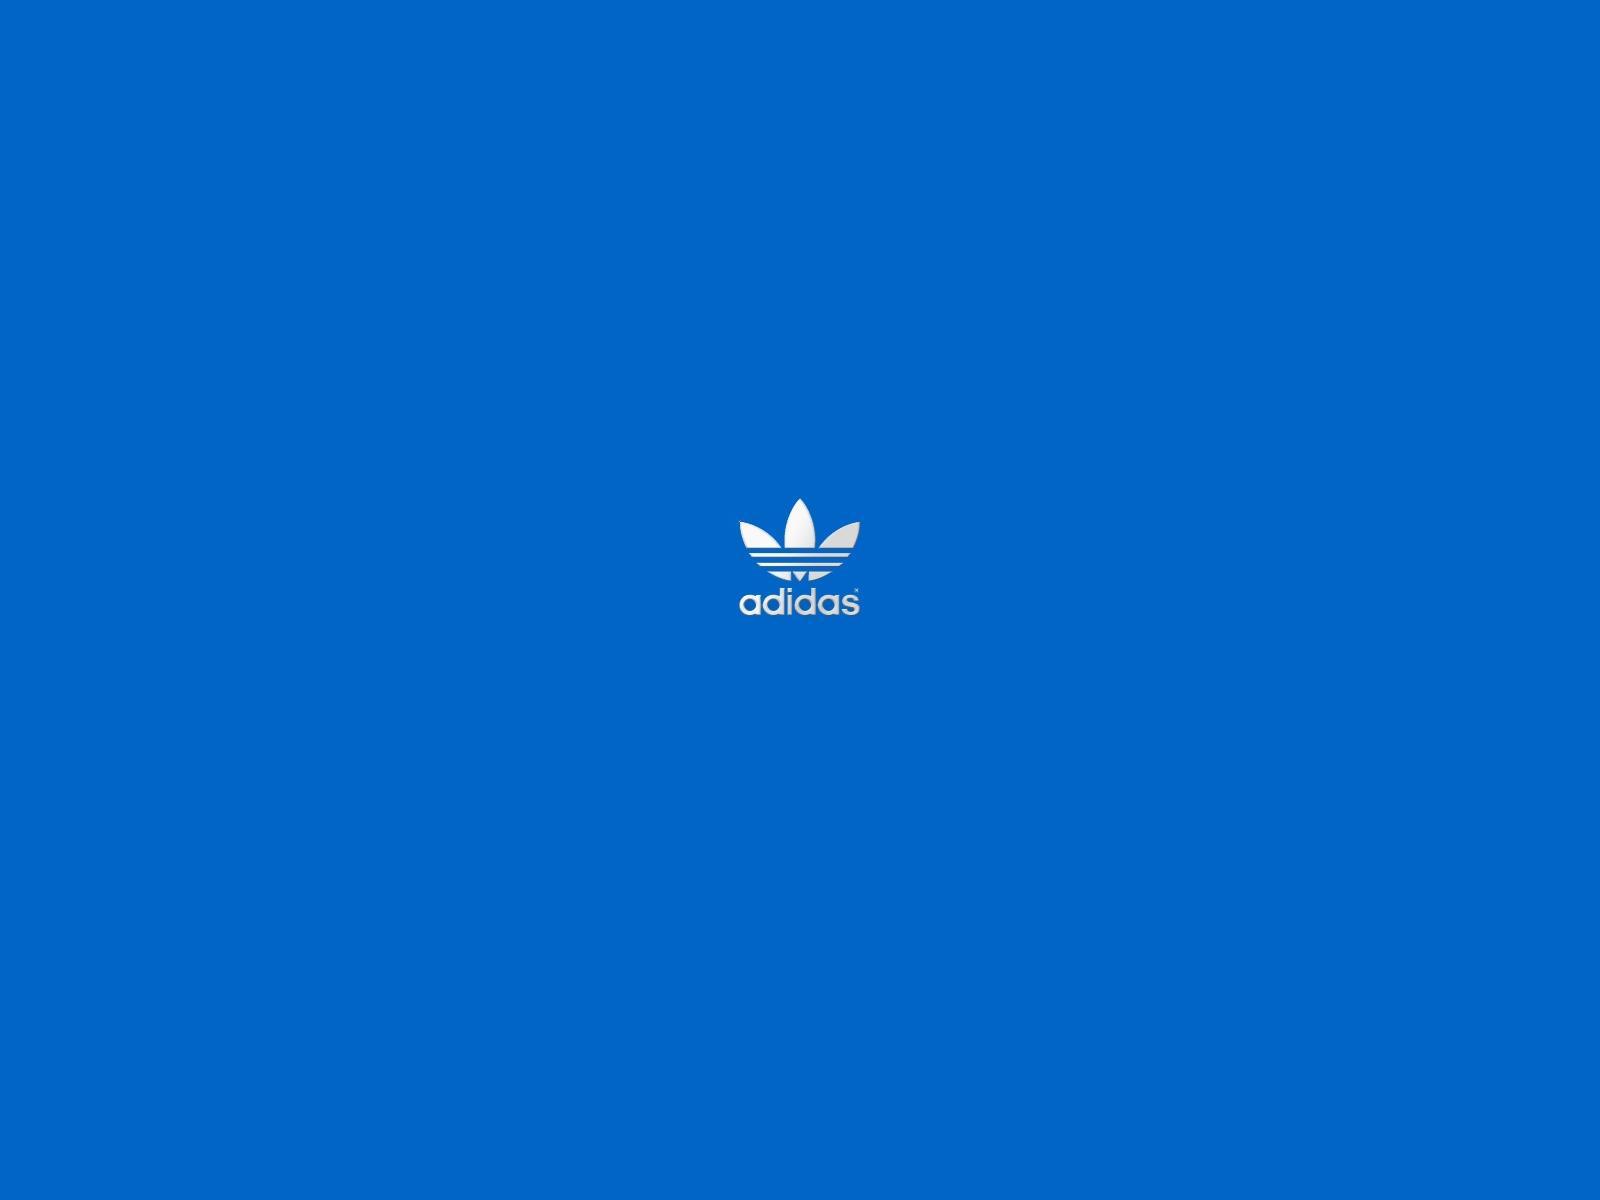 Adidas Logo Wallpapers 2016 1600x1200